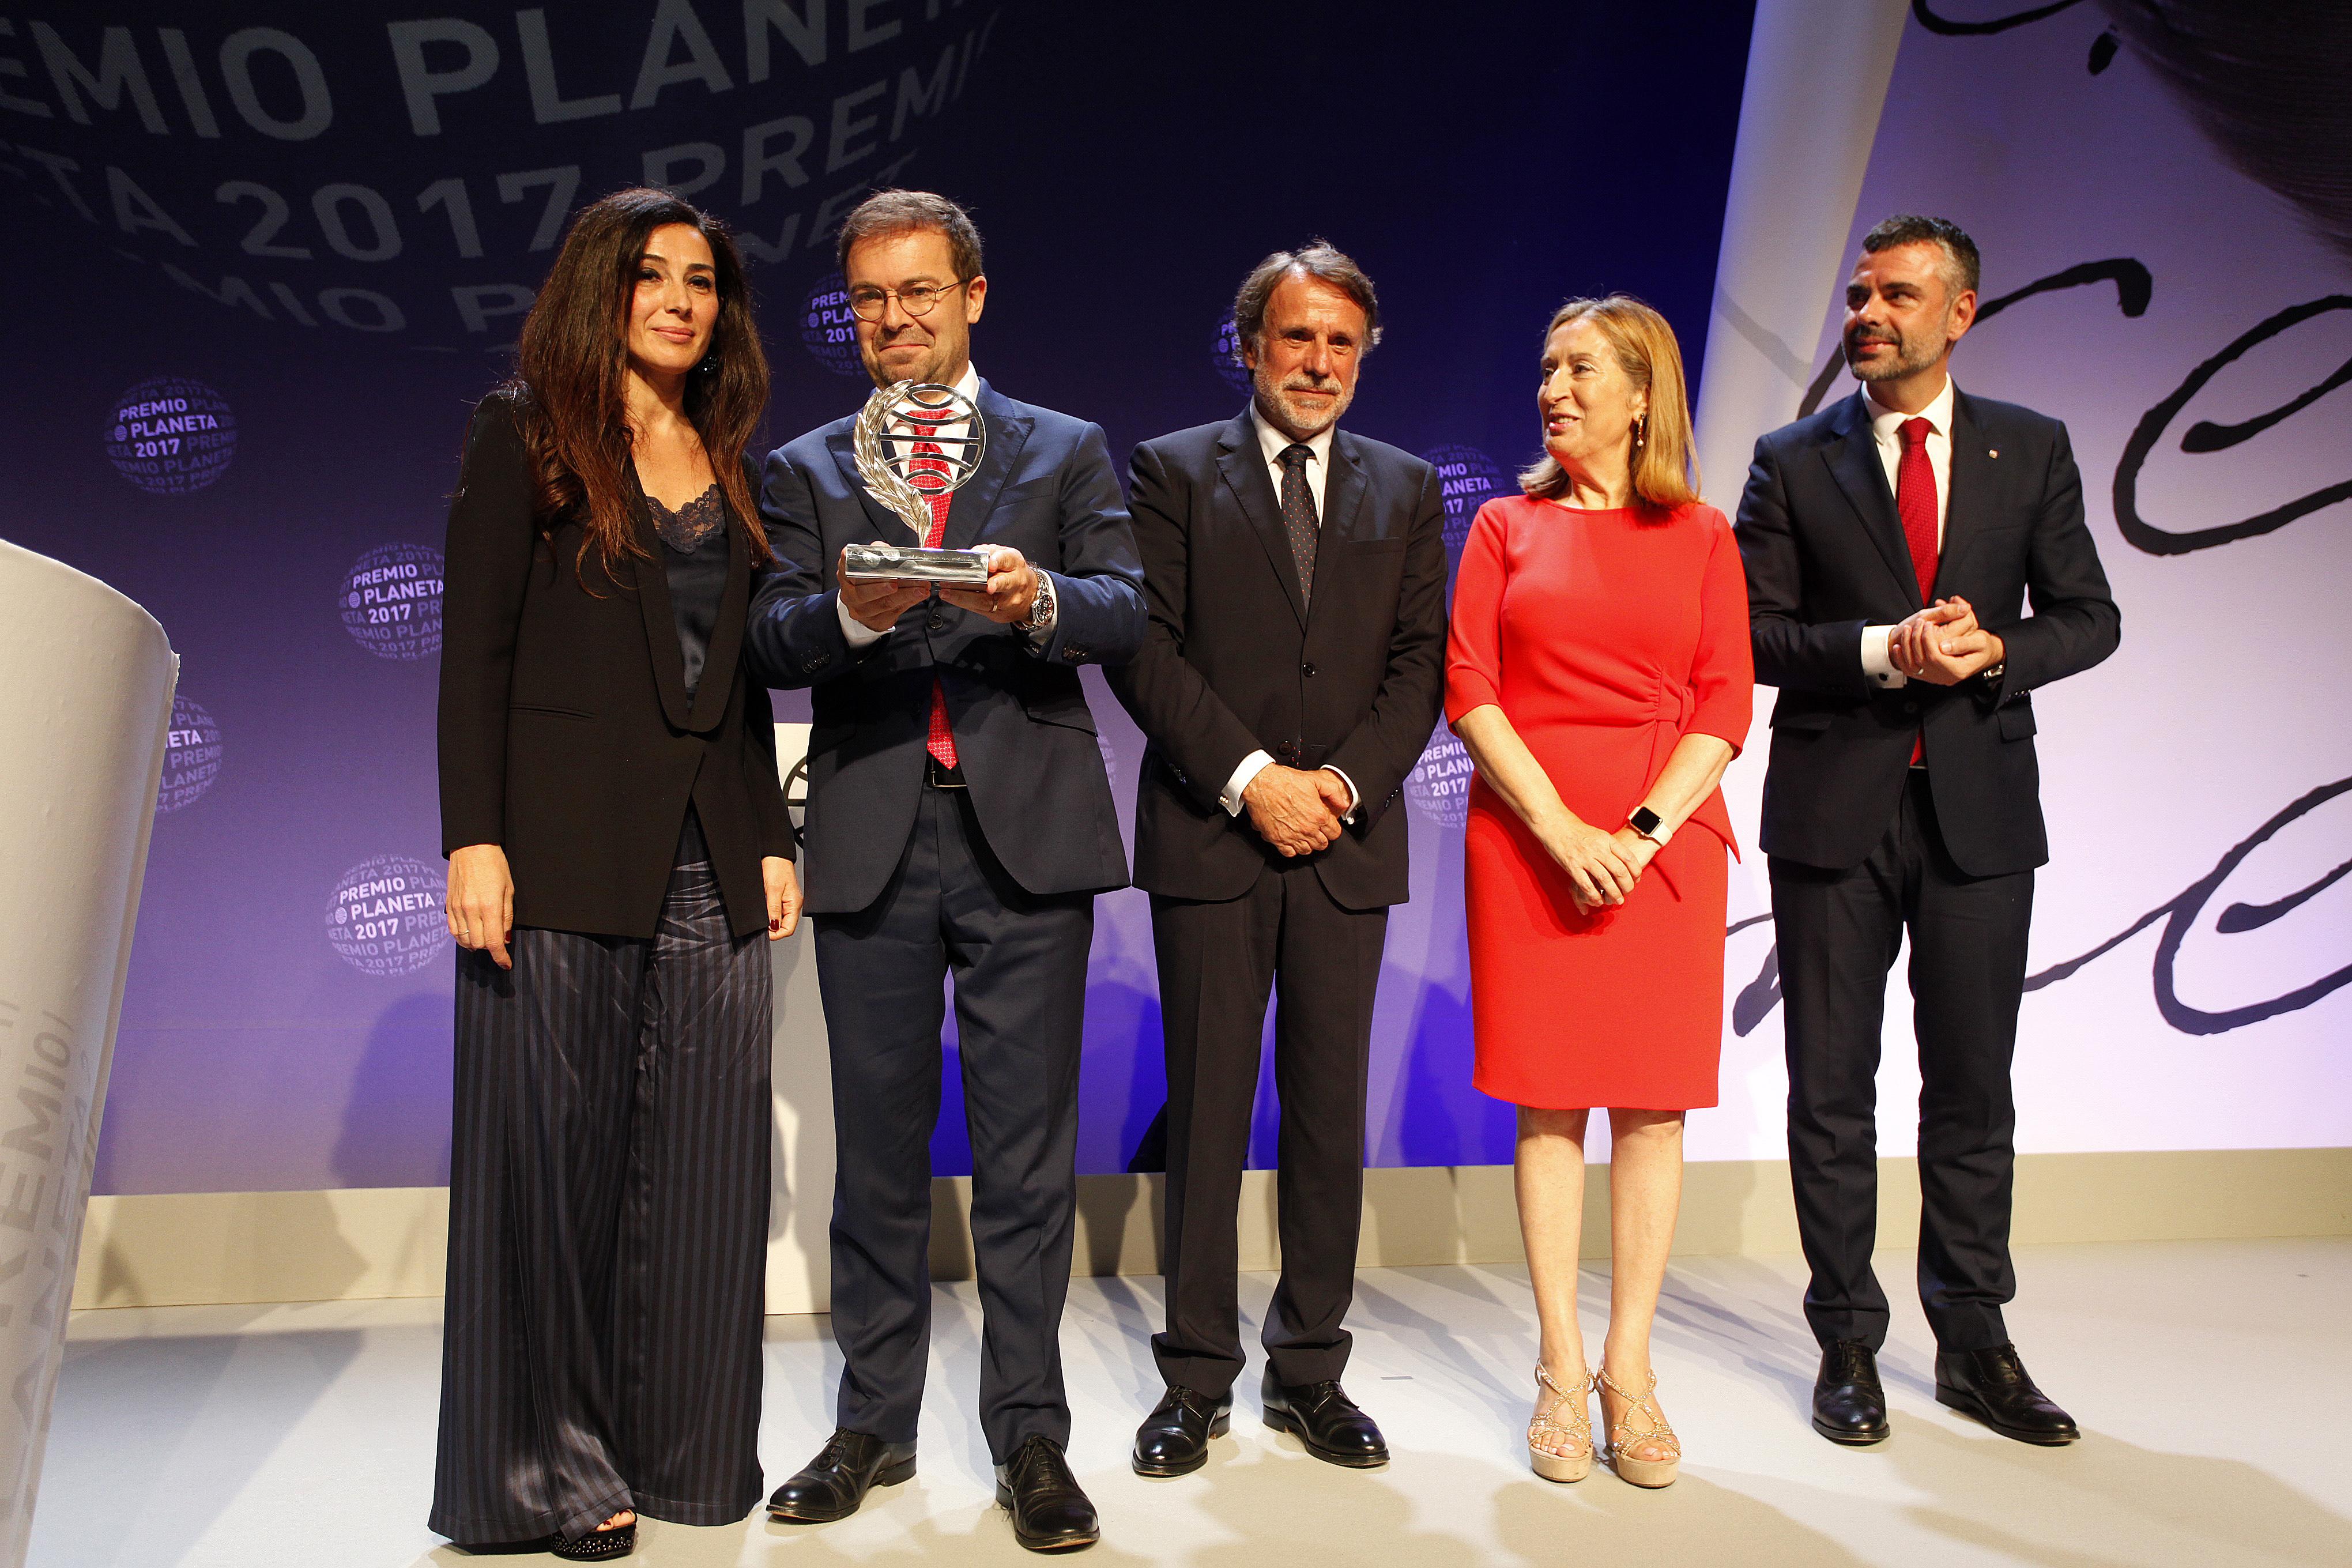 Javier Sierra Premio Planeta 2017